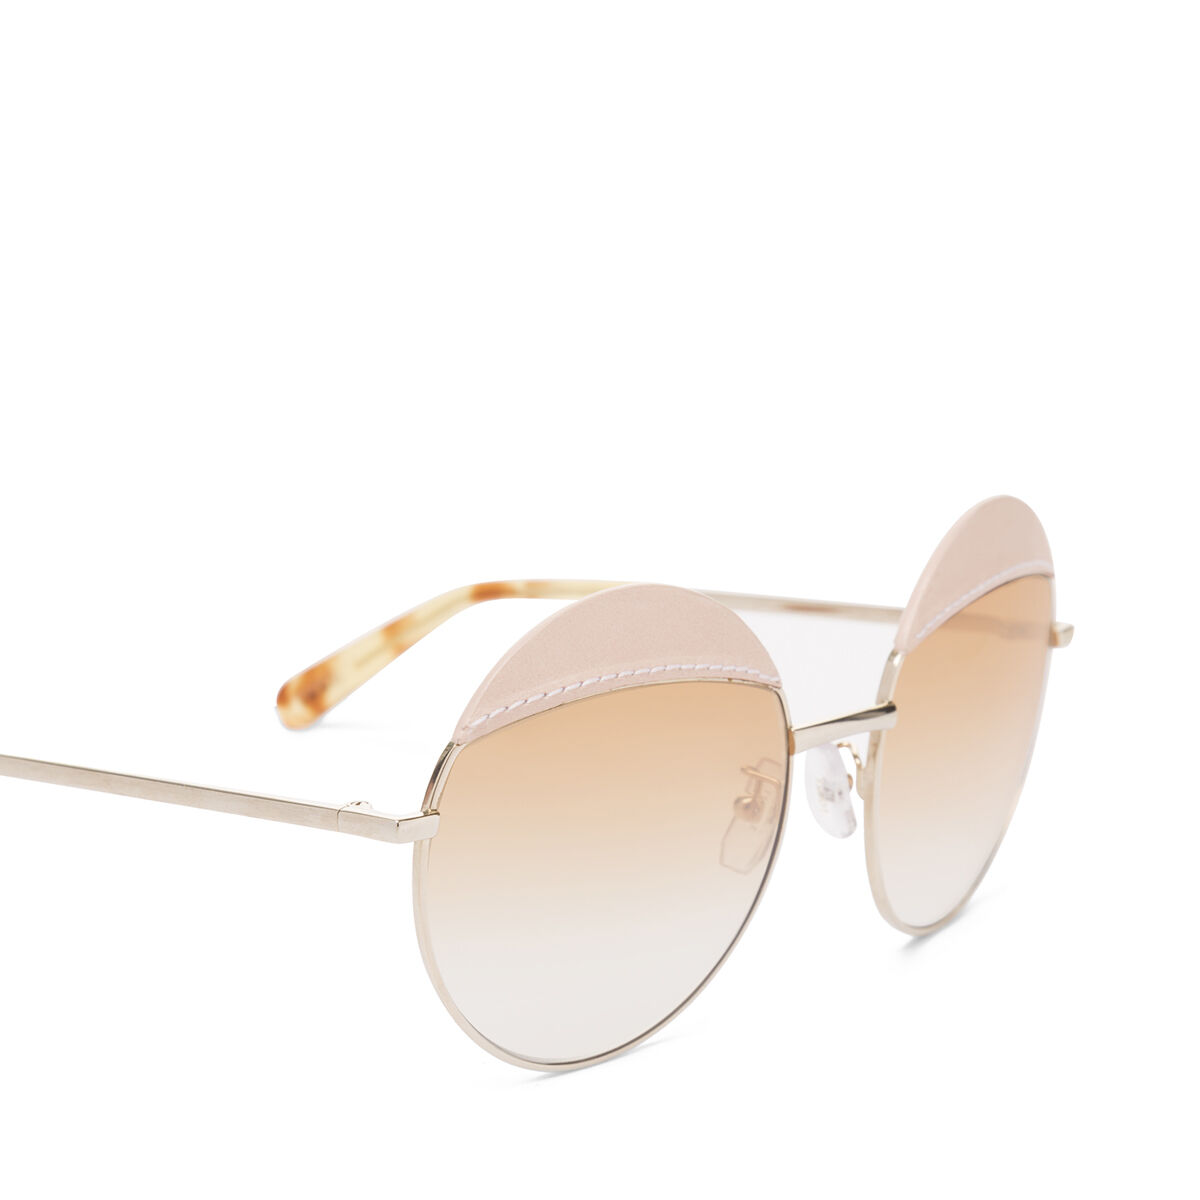 LOEWE Round Sticth Sunglasses Pink/Gradient Yellow front